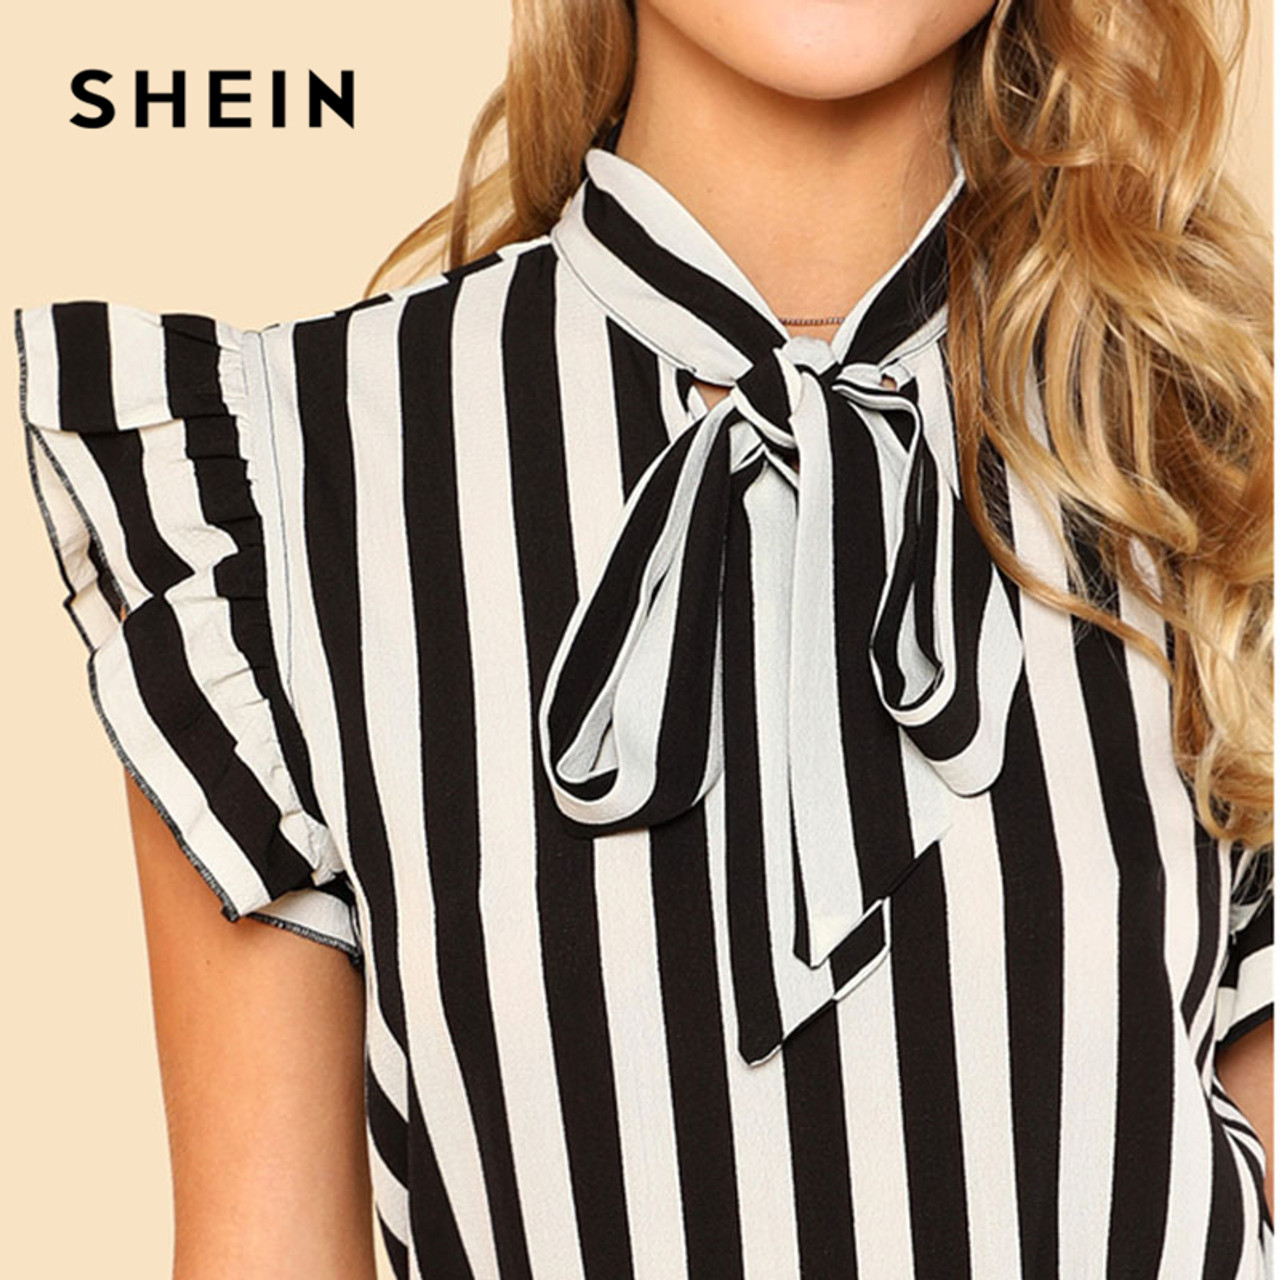 4ee74aeb55 ... SHEIN Summer Top Elegant Work Women Blouses Cap Sleeve Black and White  Tie Neck Butterfly Sleeve